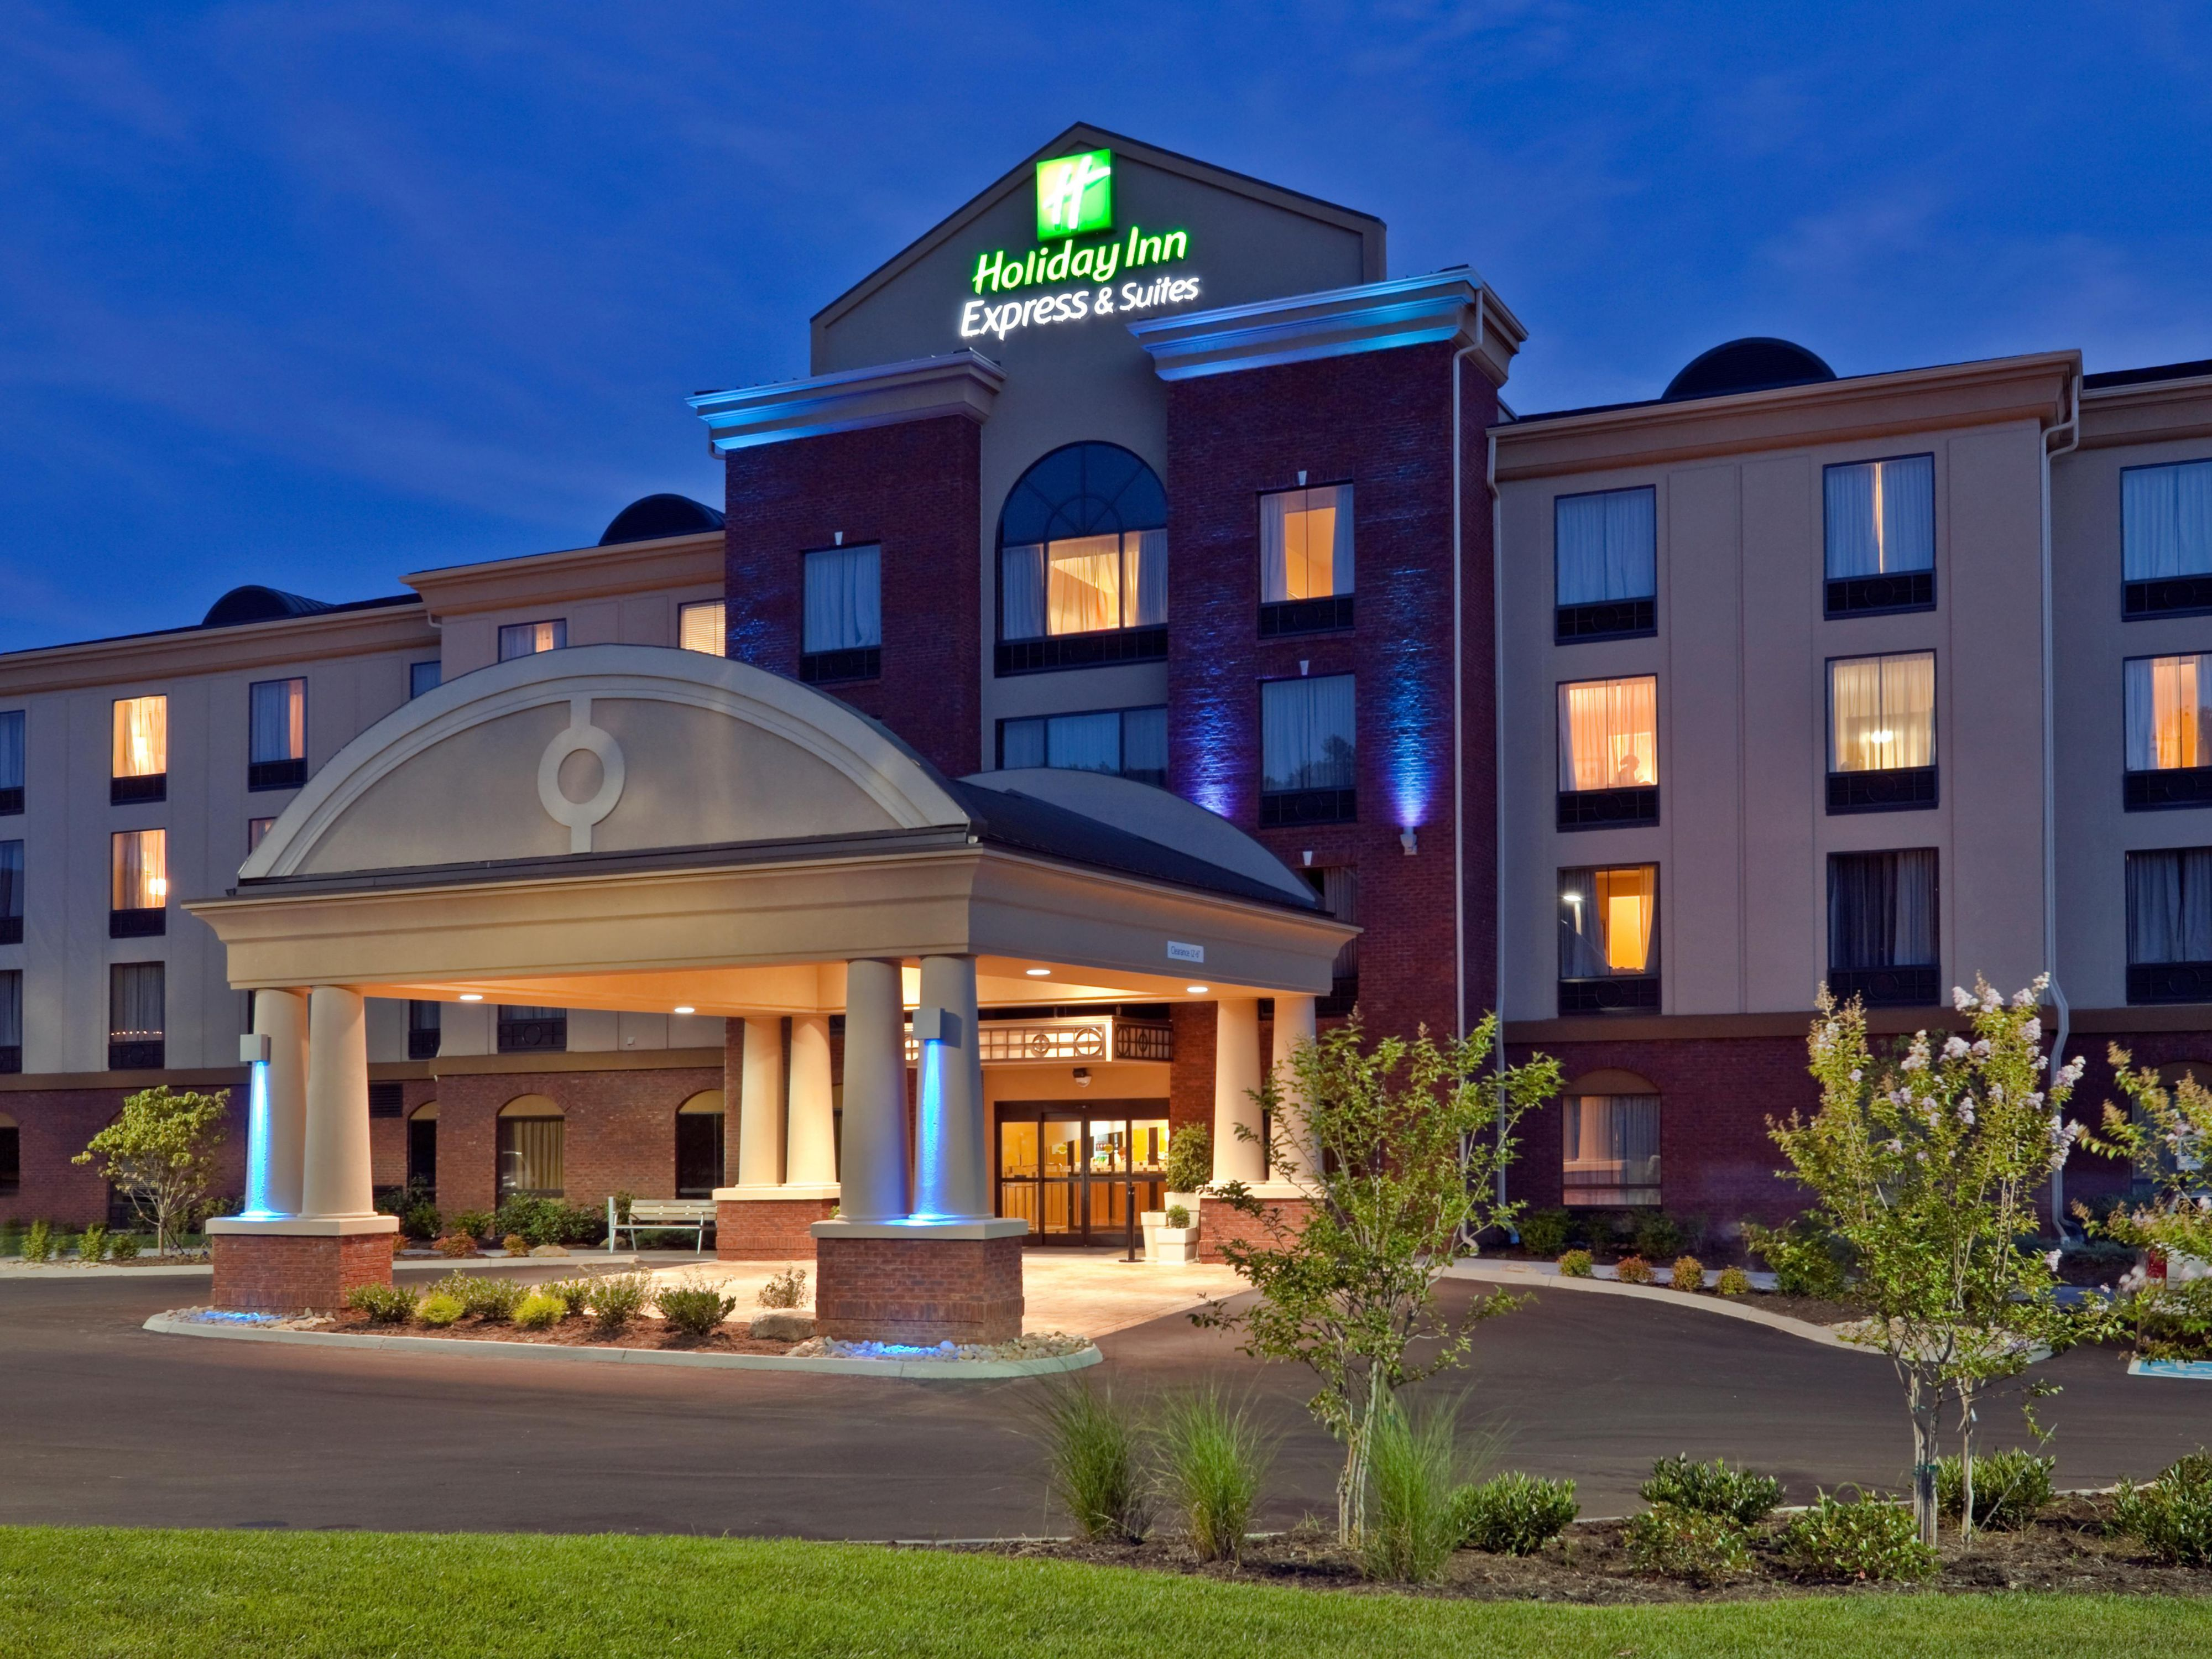 Gatlinburg Tn Hotels >> Find Gatlinburg Hotels Top 14 Hotels In Gatlinburg Tn By Ihg